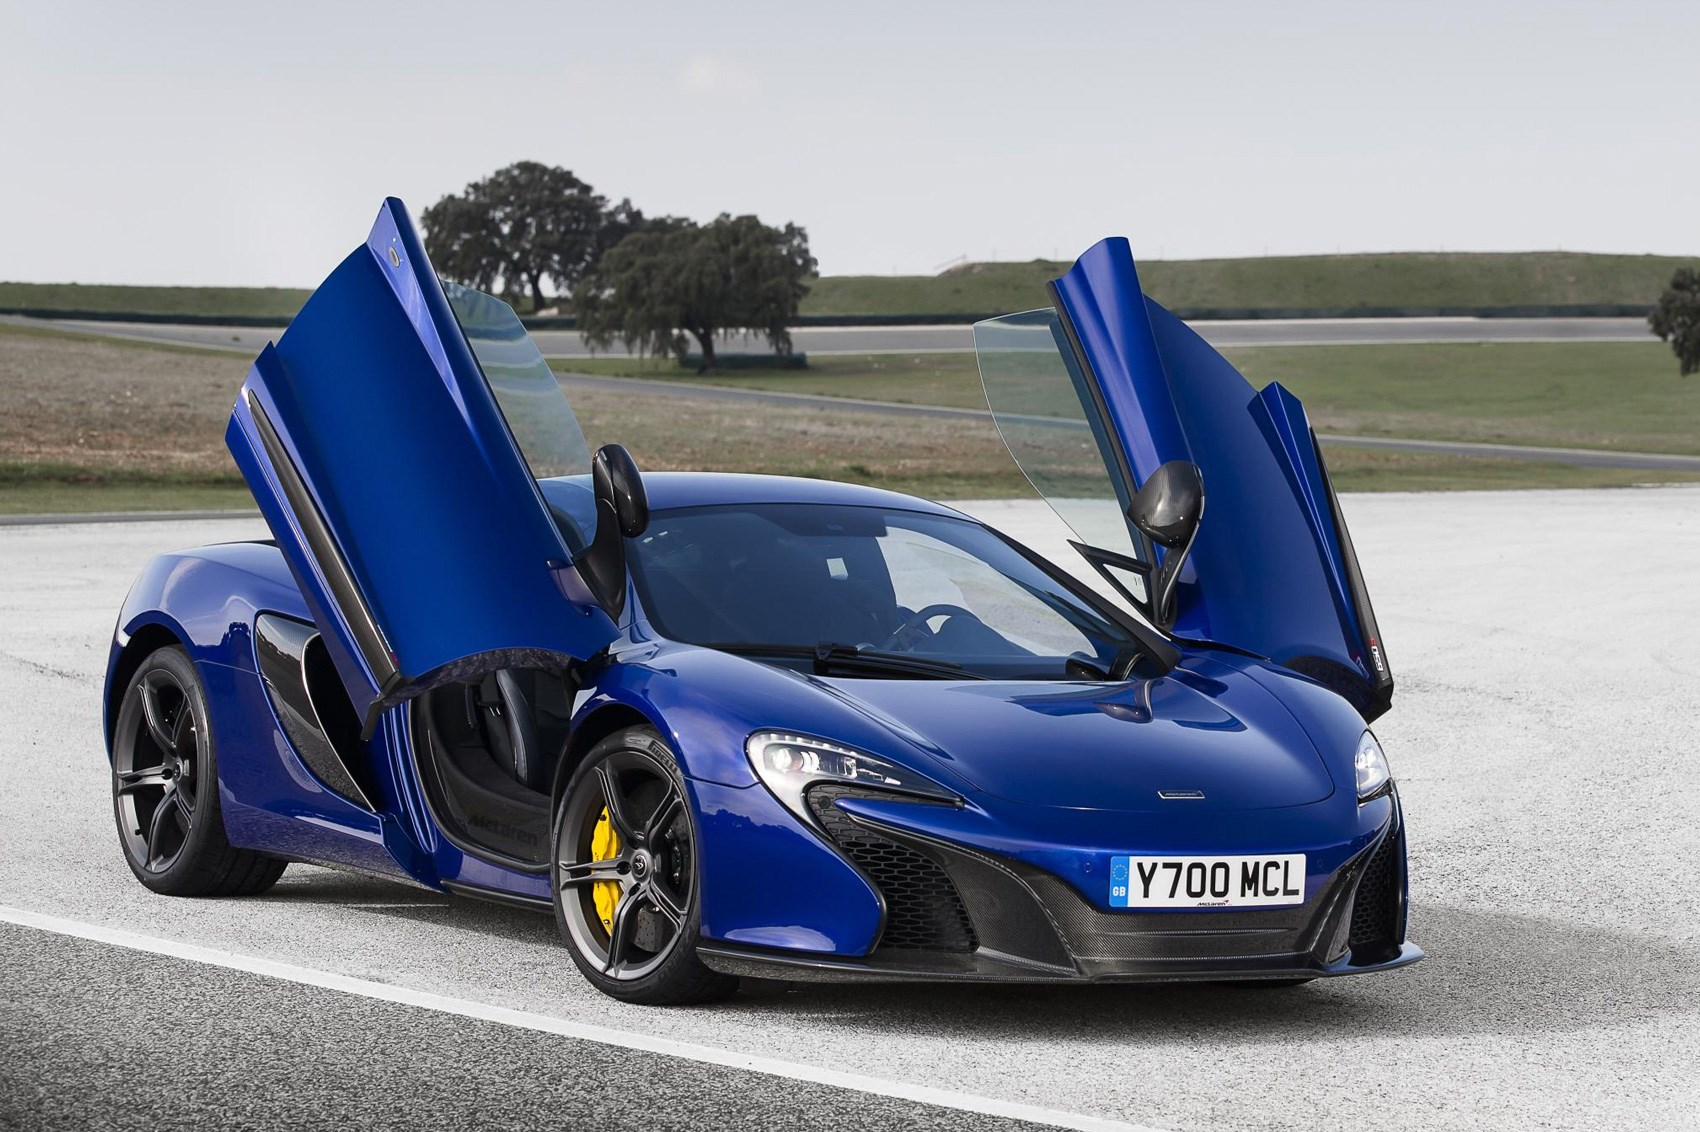 McLaren storms into Geneva with new 720S supercar | CAR Magazine